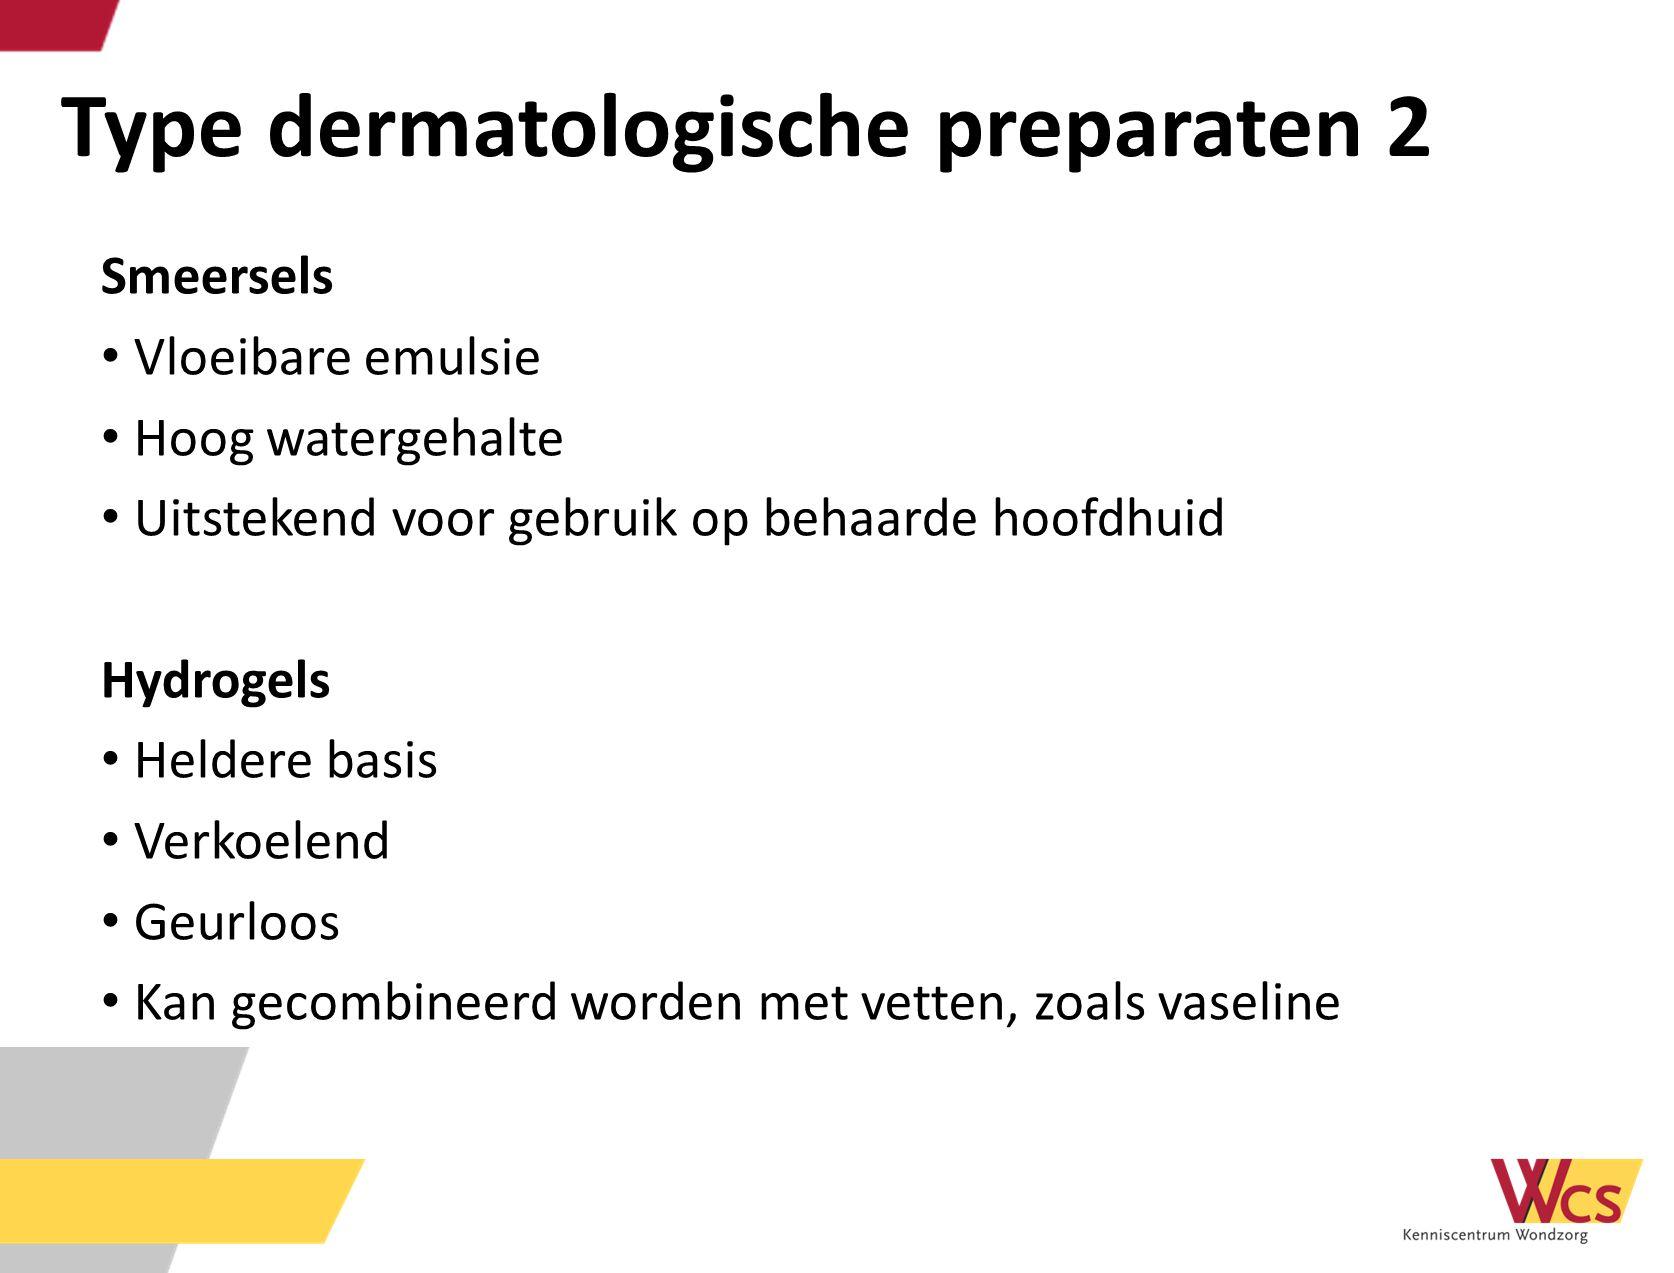 Type dermatologische preparaten 2